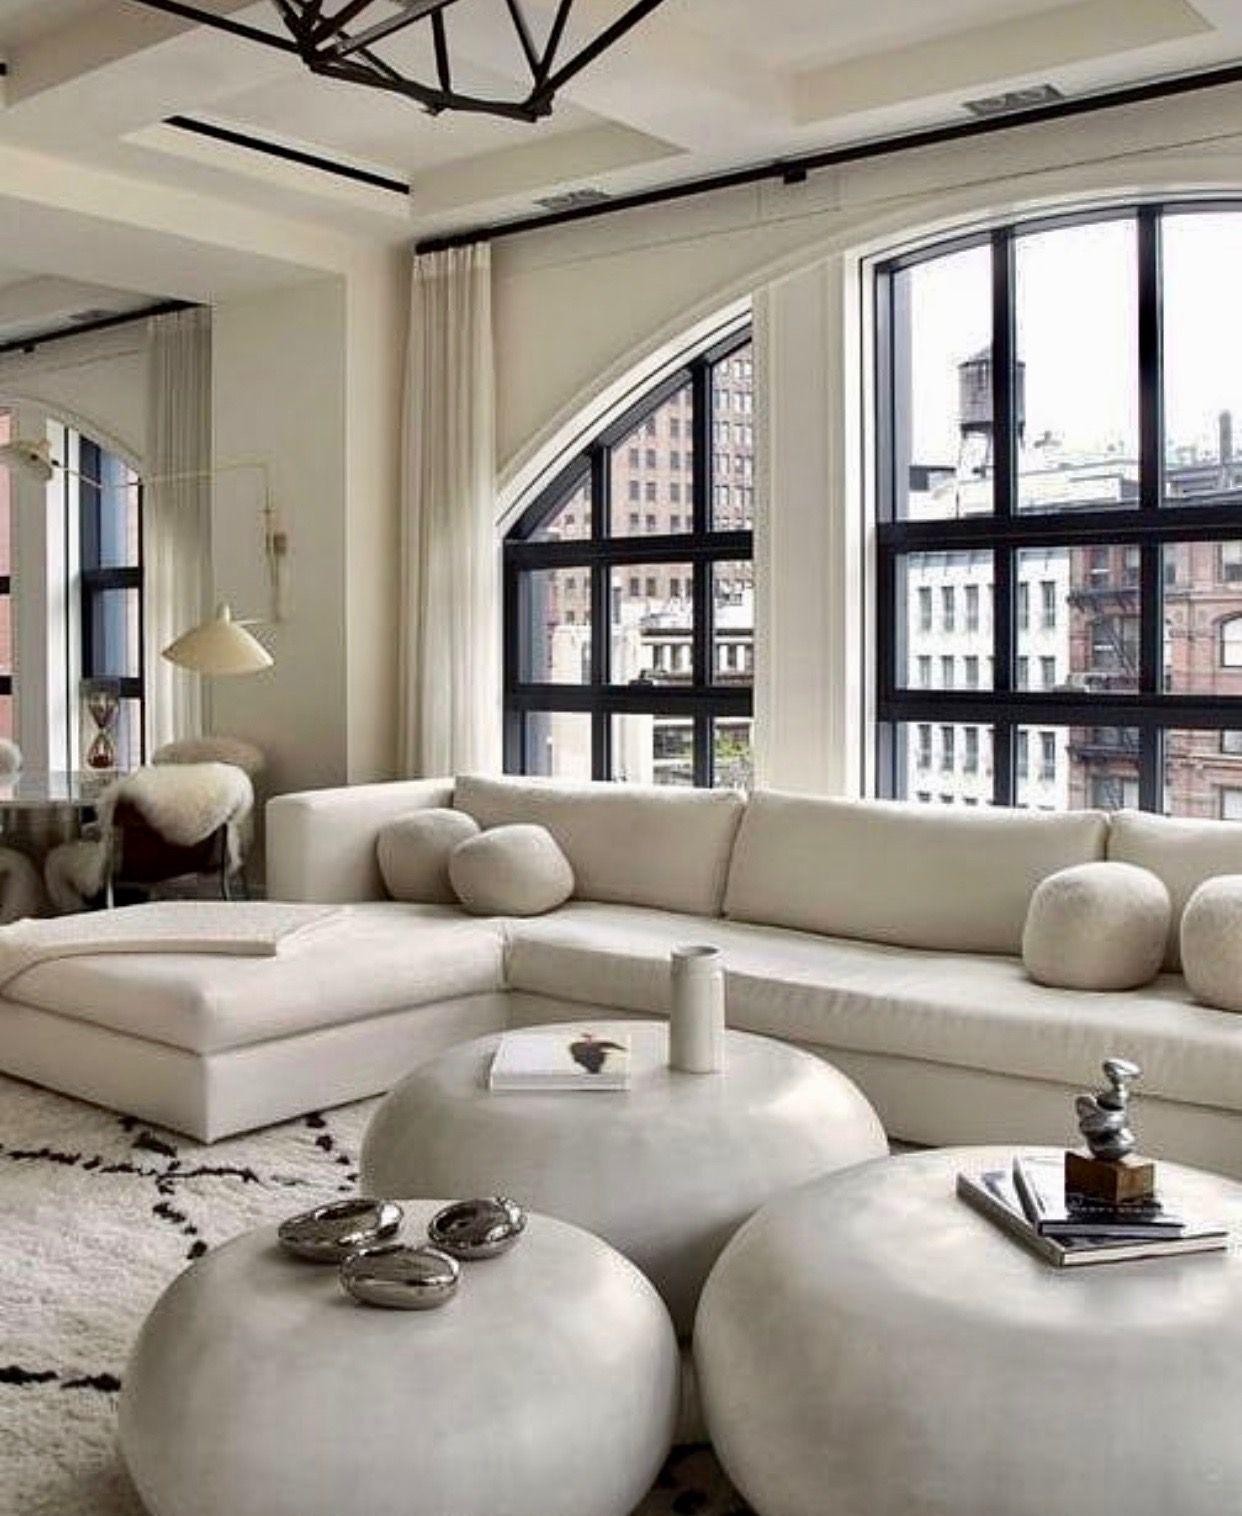 Design Mobel Wohnzimmer - Home Decor Wallpaper